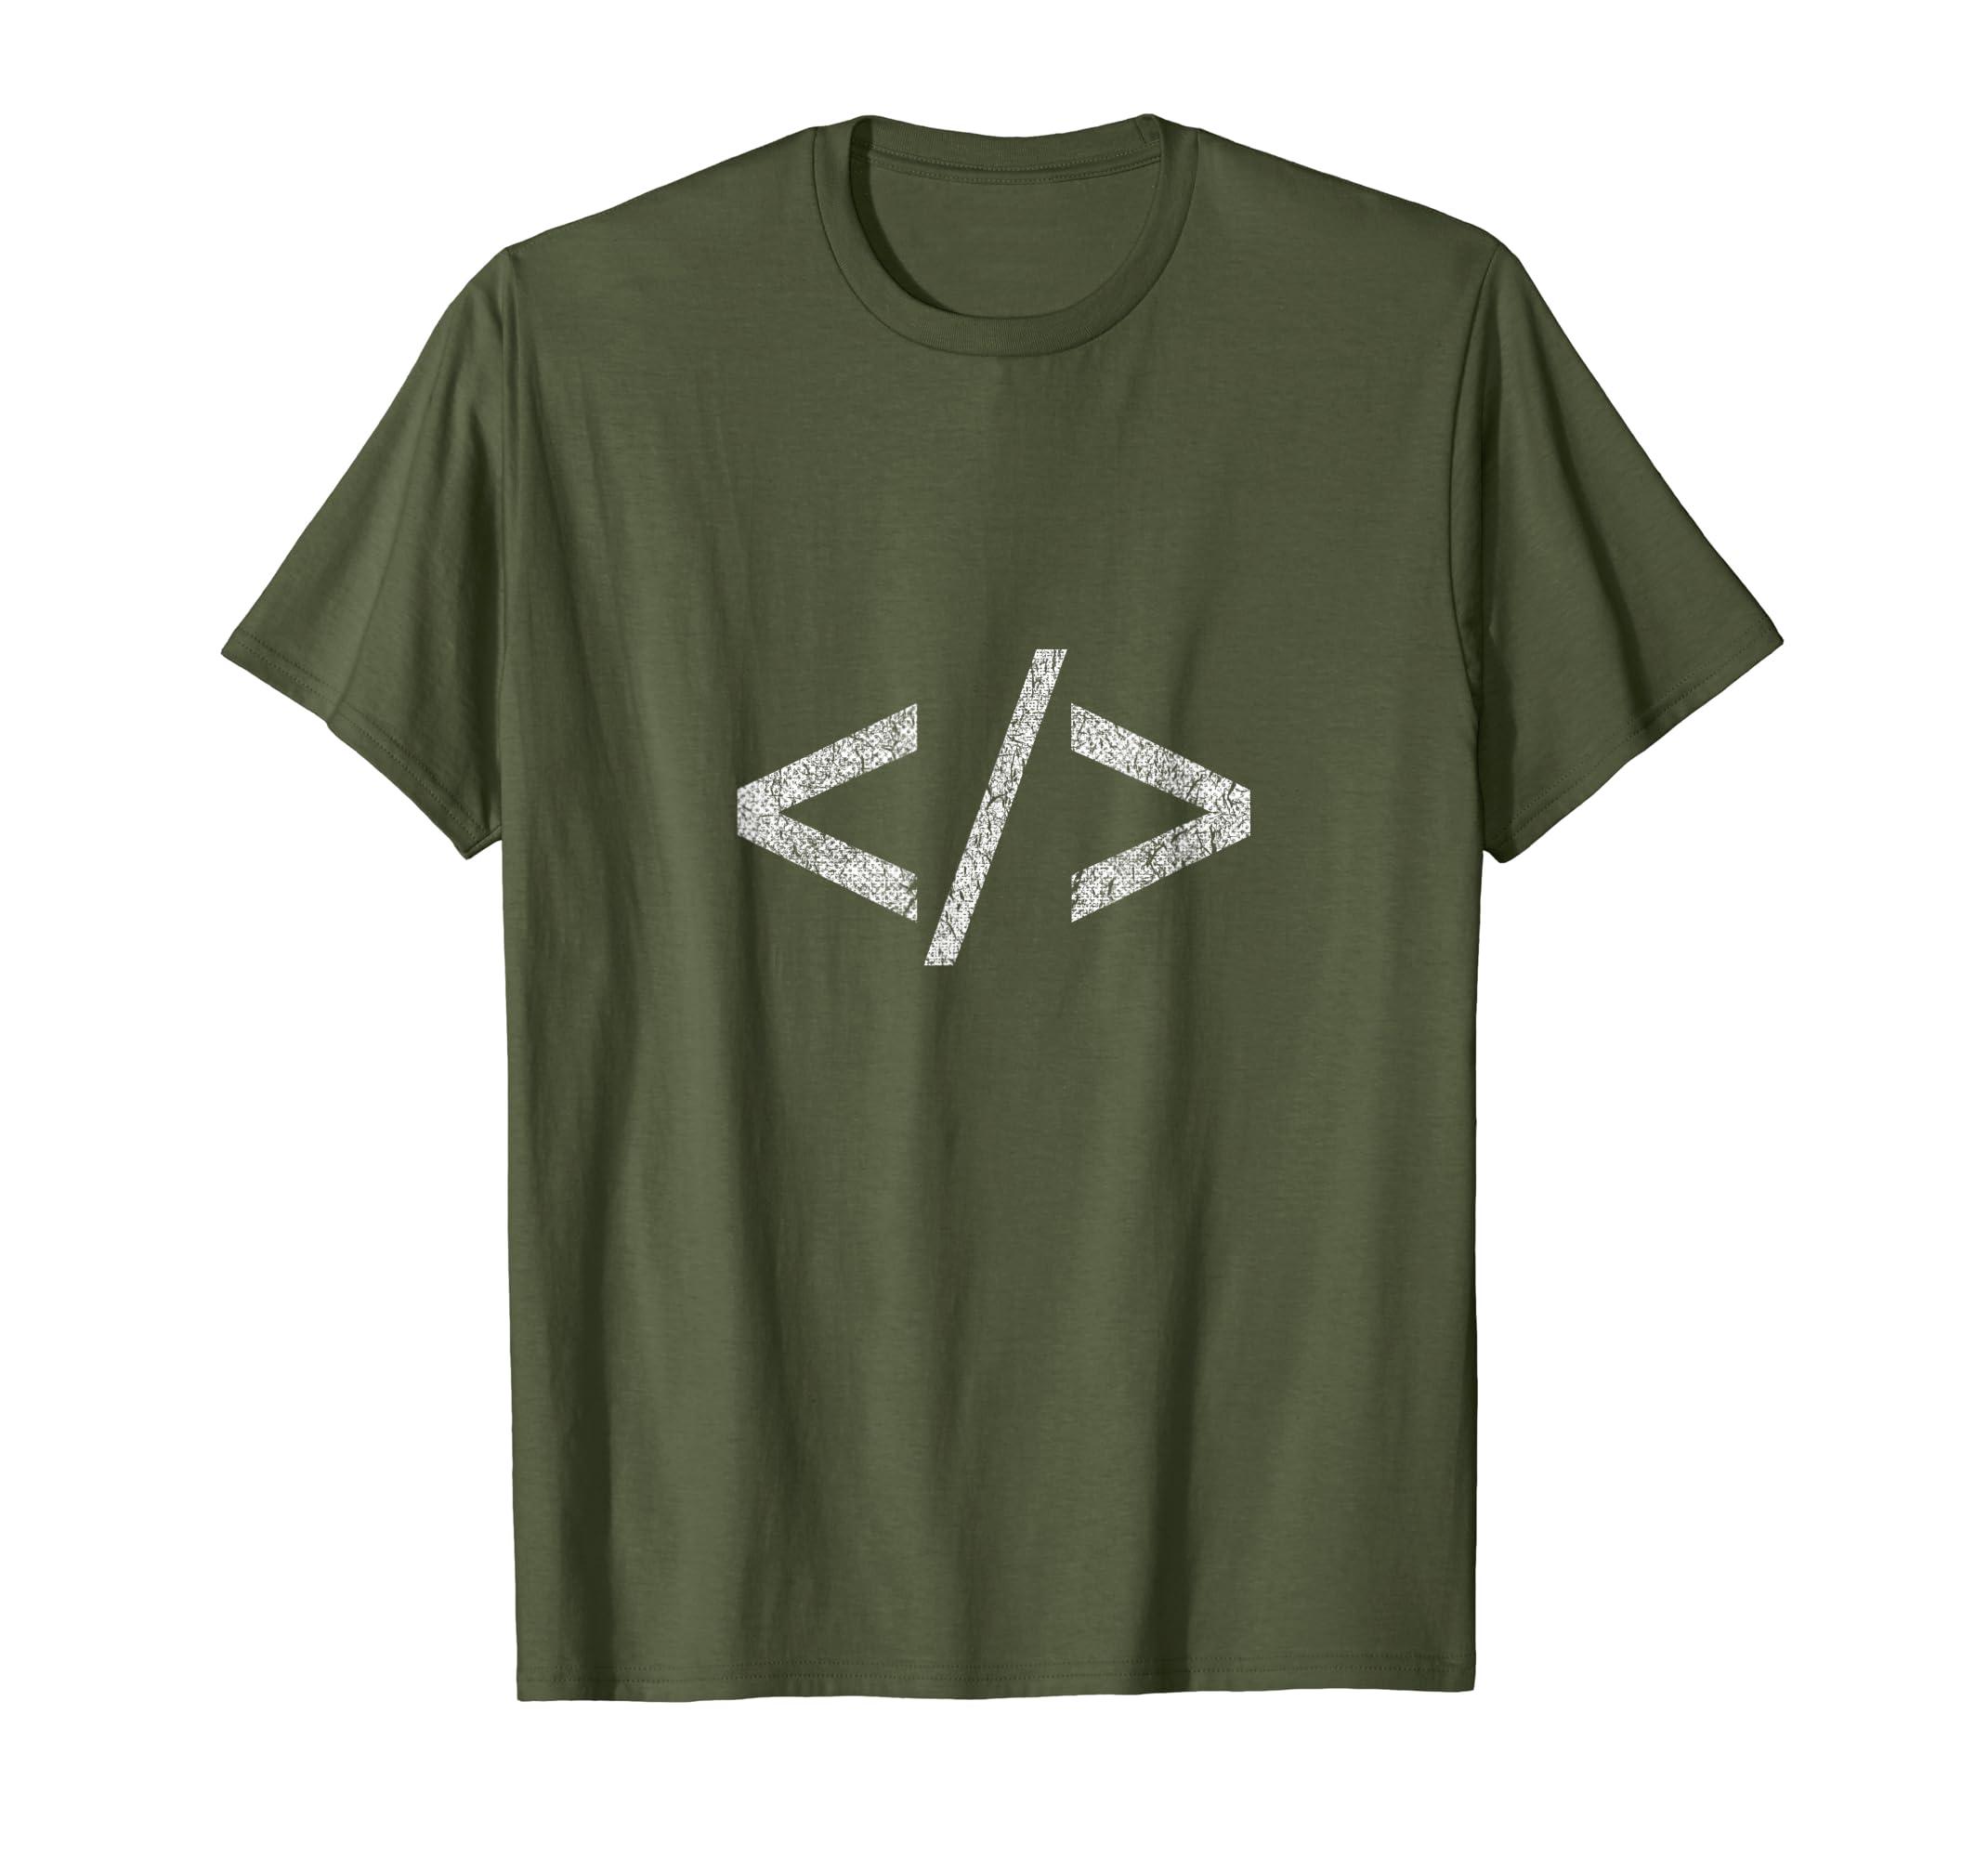 Amazon Minimal Html Tag T Shirt Web Designer Tee Shirts Clothing